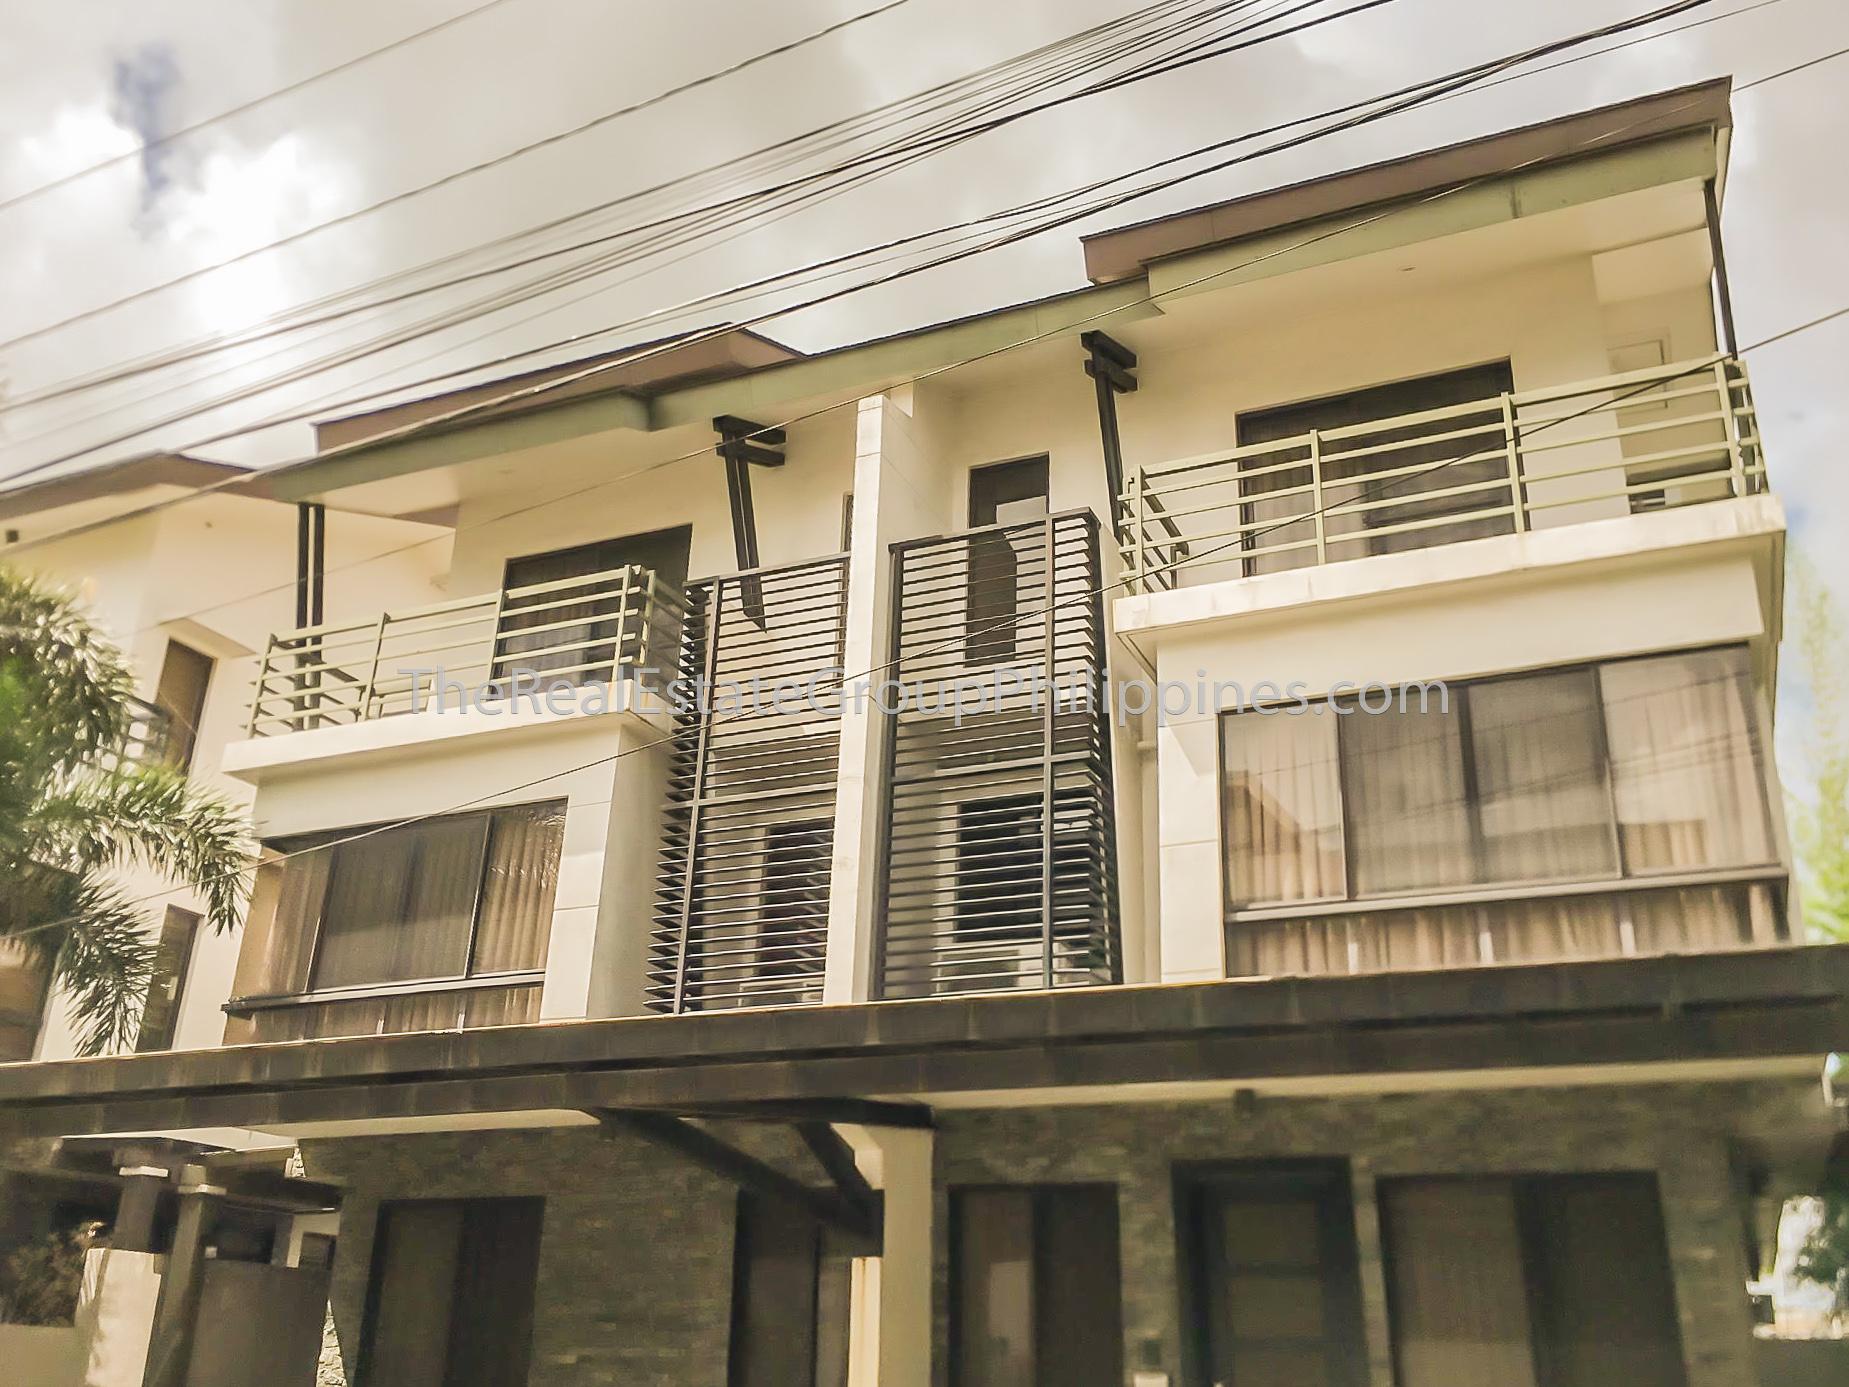 4BR Townhouse For Sale, Mahogany Place 3, Brgy. Bambang, Taguig City-6